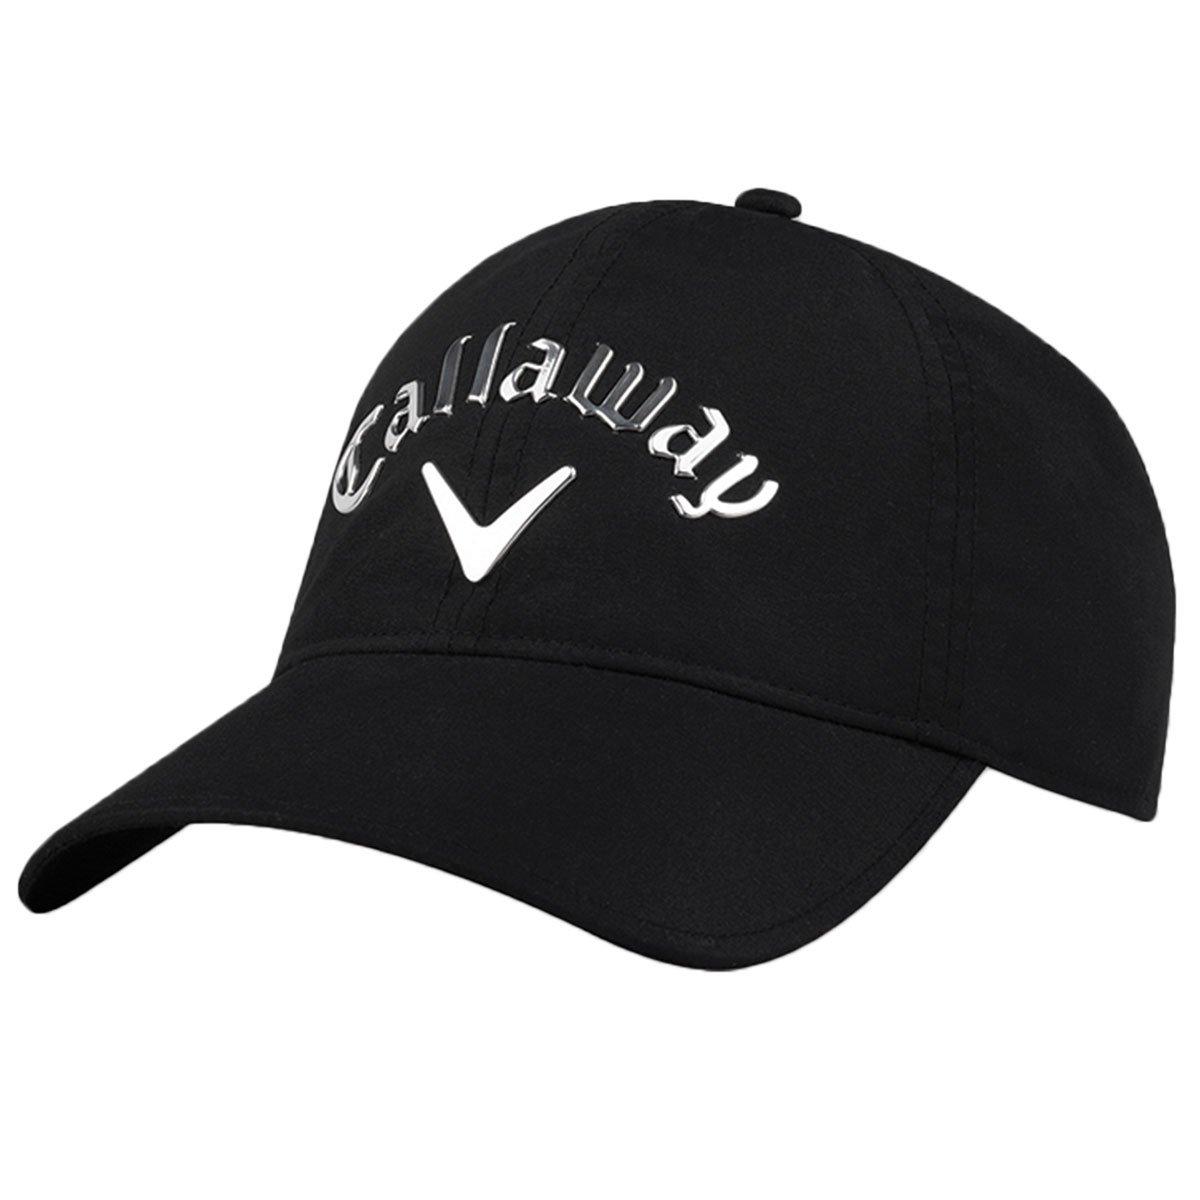 9bedd219d0c3b Callaway Golf Waterproof Hat